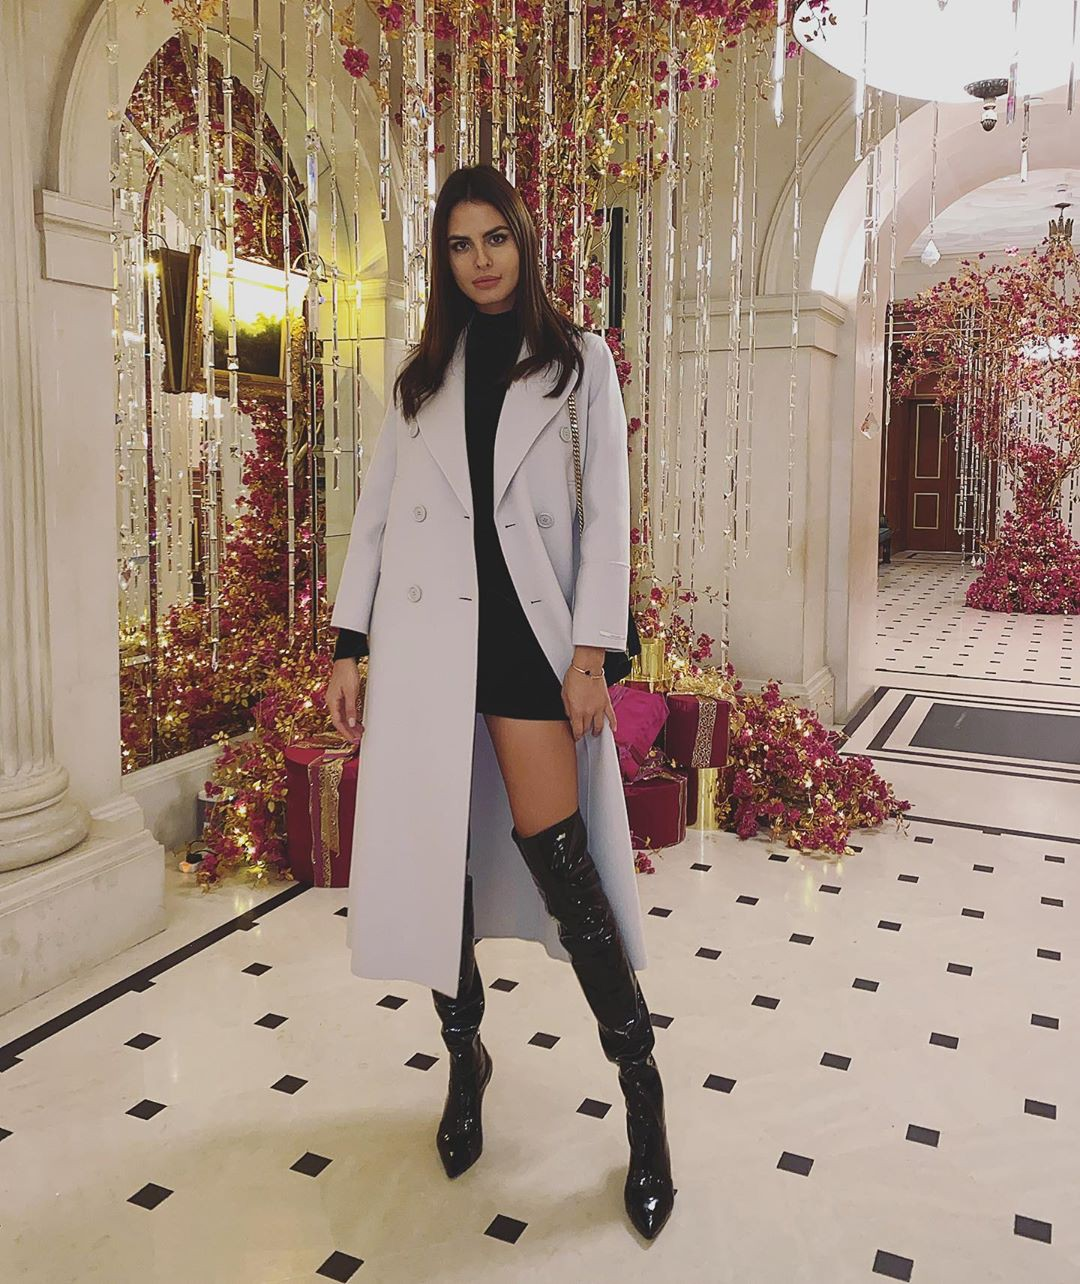 Bojana Krsmanovic knee-high boot, tights colour dress, hot legs girls